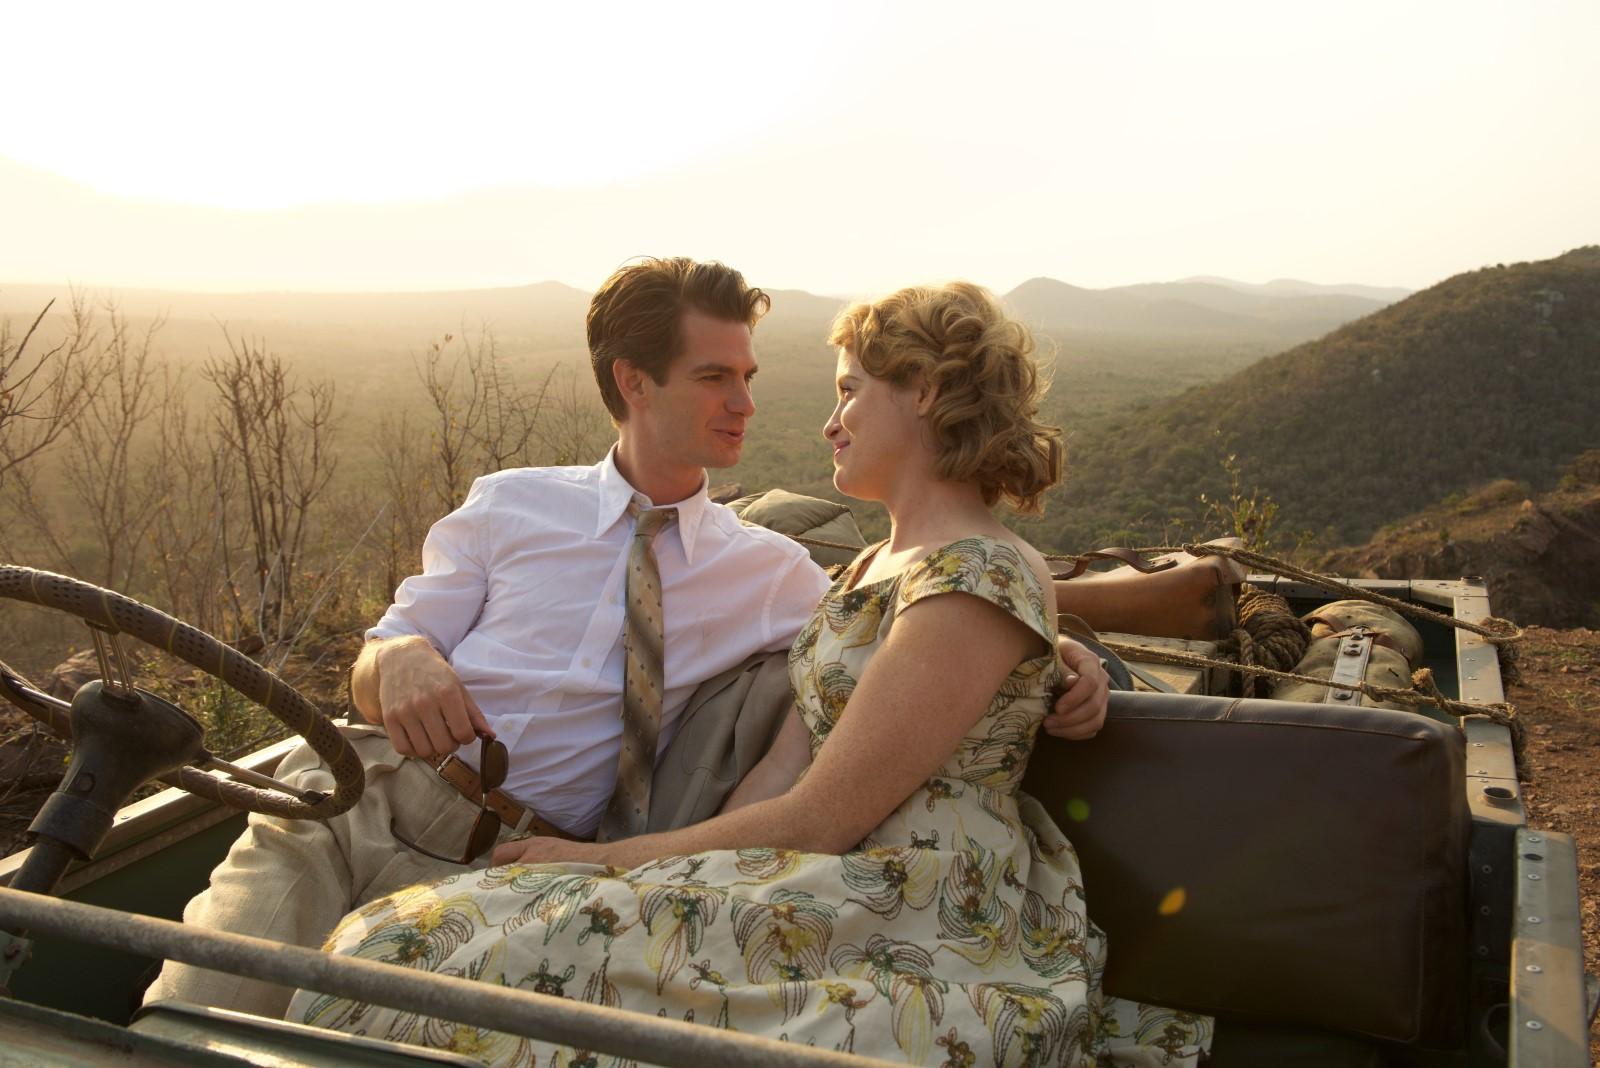 Breathe Claire Foy Andrew Garfield critique film avis image